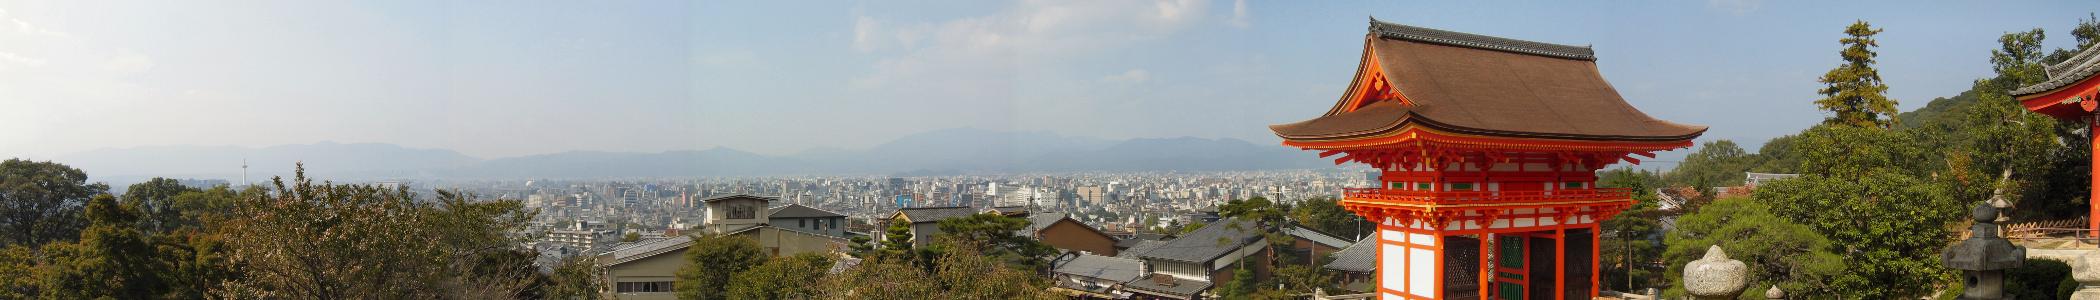 Kyoto  Higashiyama  U2013 Travel Guide At Wikivoyage